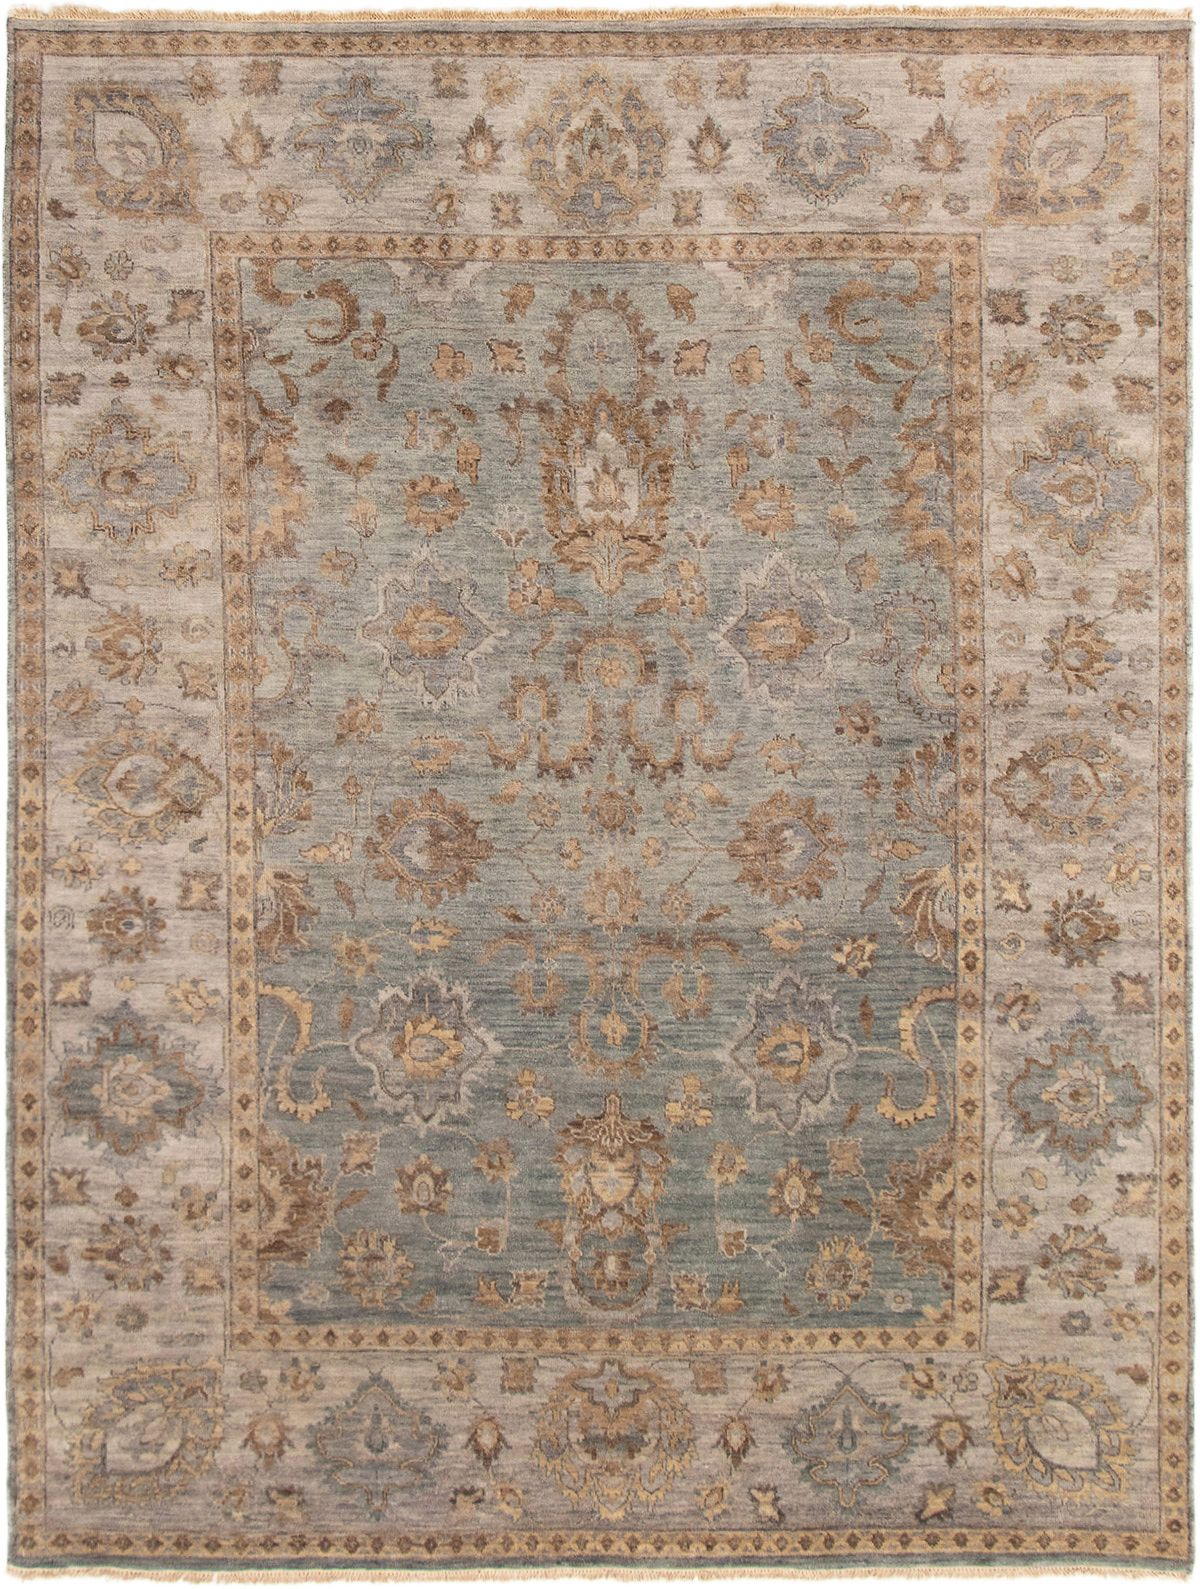 "Hand-knotted Finest Ushak Light Denim Blue Wool Rug 7'9"" x 10'0"" Size: 7'9"" x 10'0"""